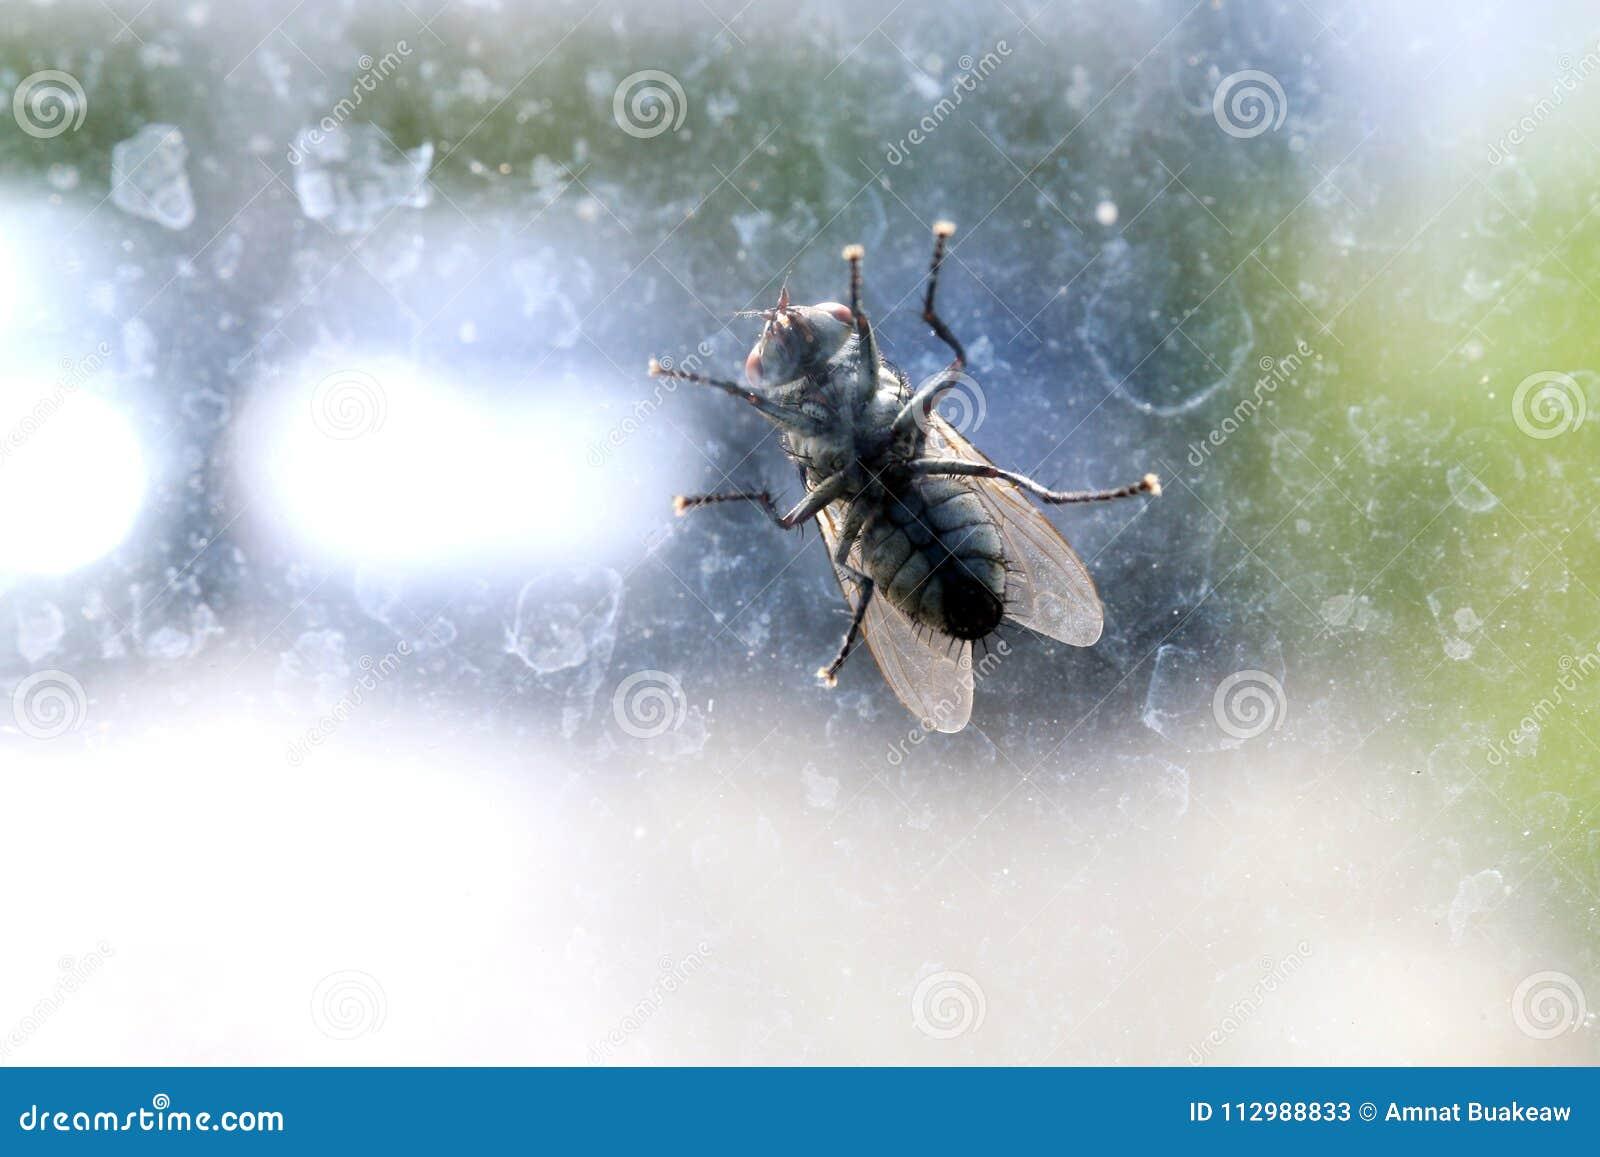 House fly on the windshield dirty, Chrysomya megacephala Fabricius, Musca domestica, fly contagious diseases